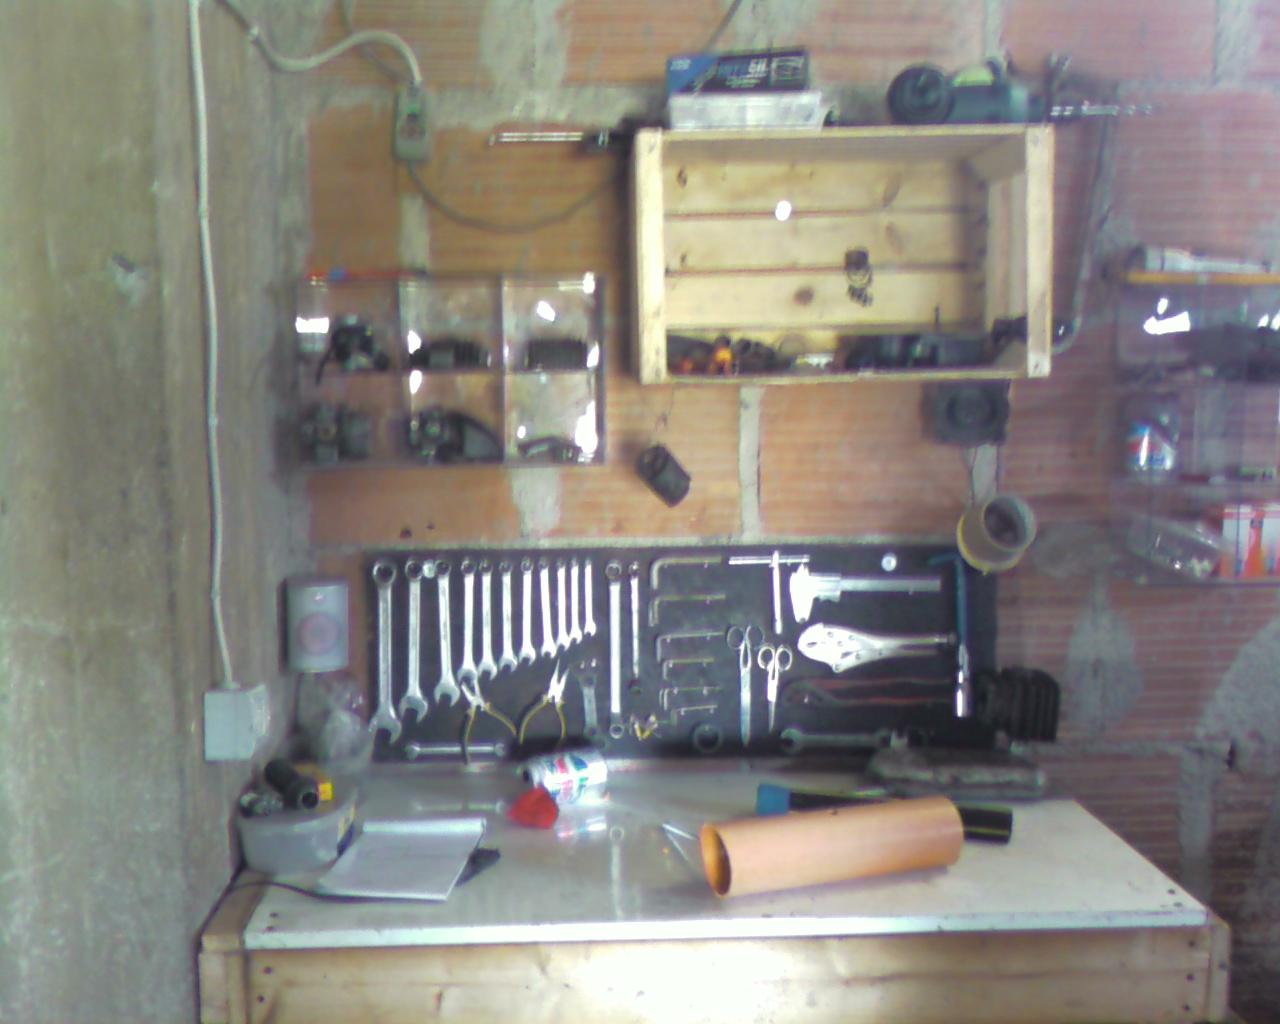 Ciao cross club raccolta foto i vostri garage officina for Officina garage indipendente